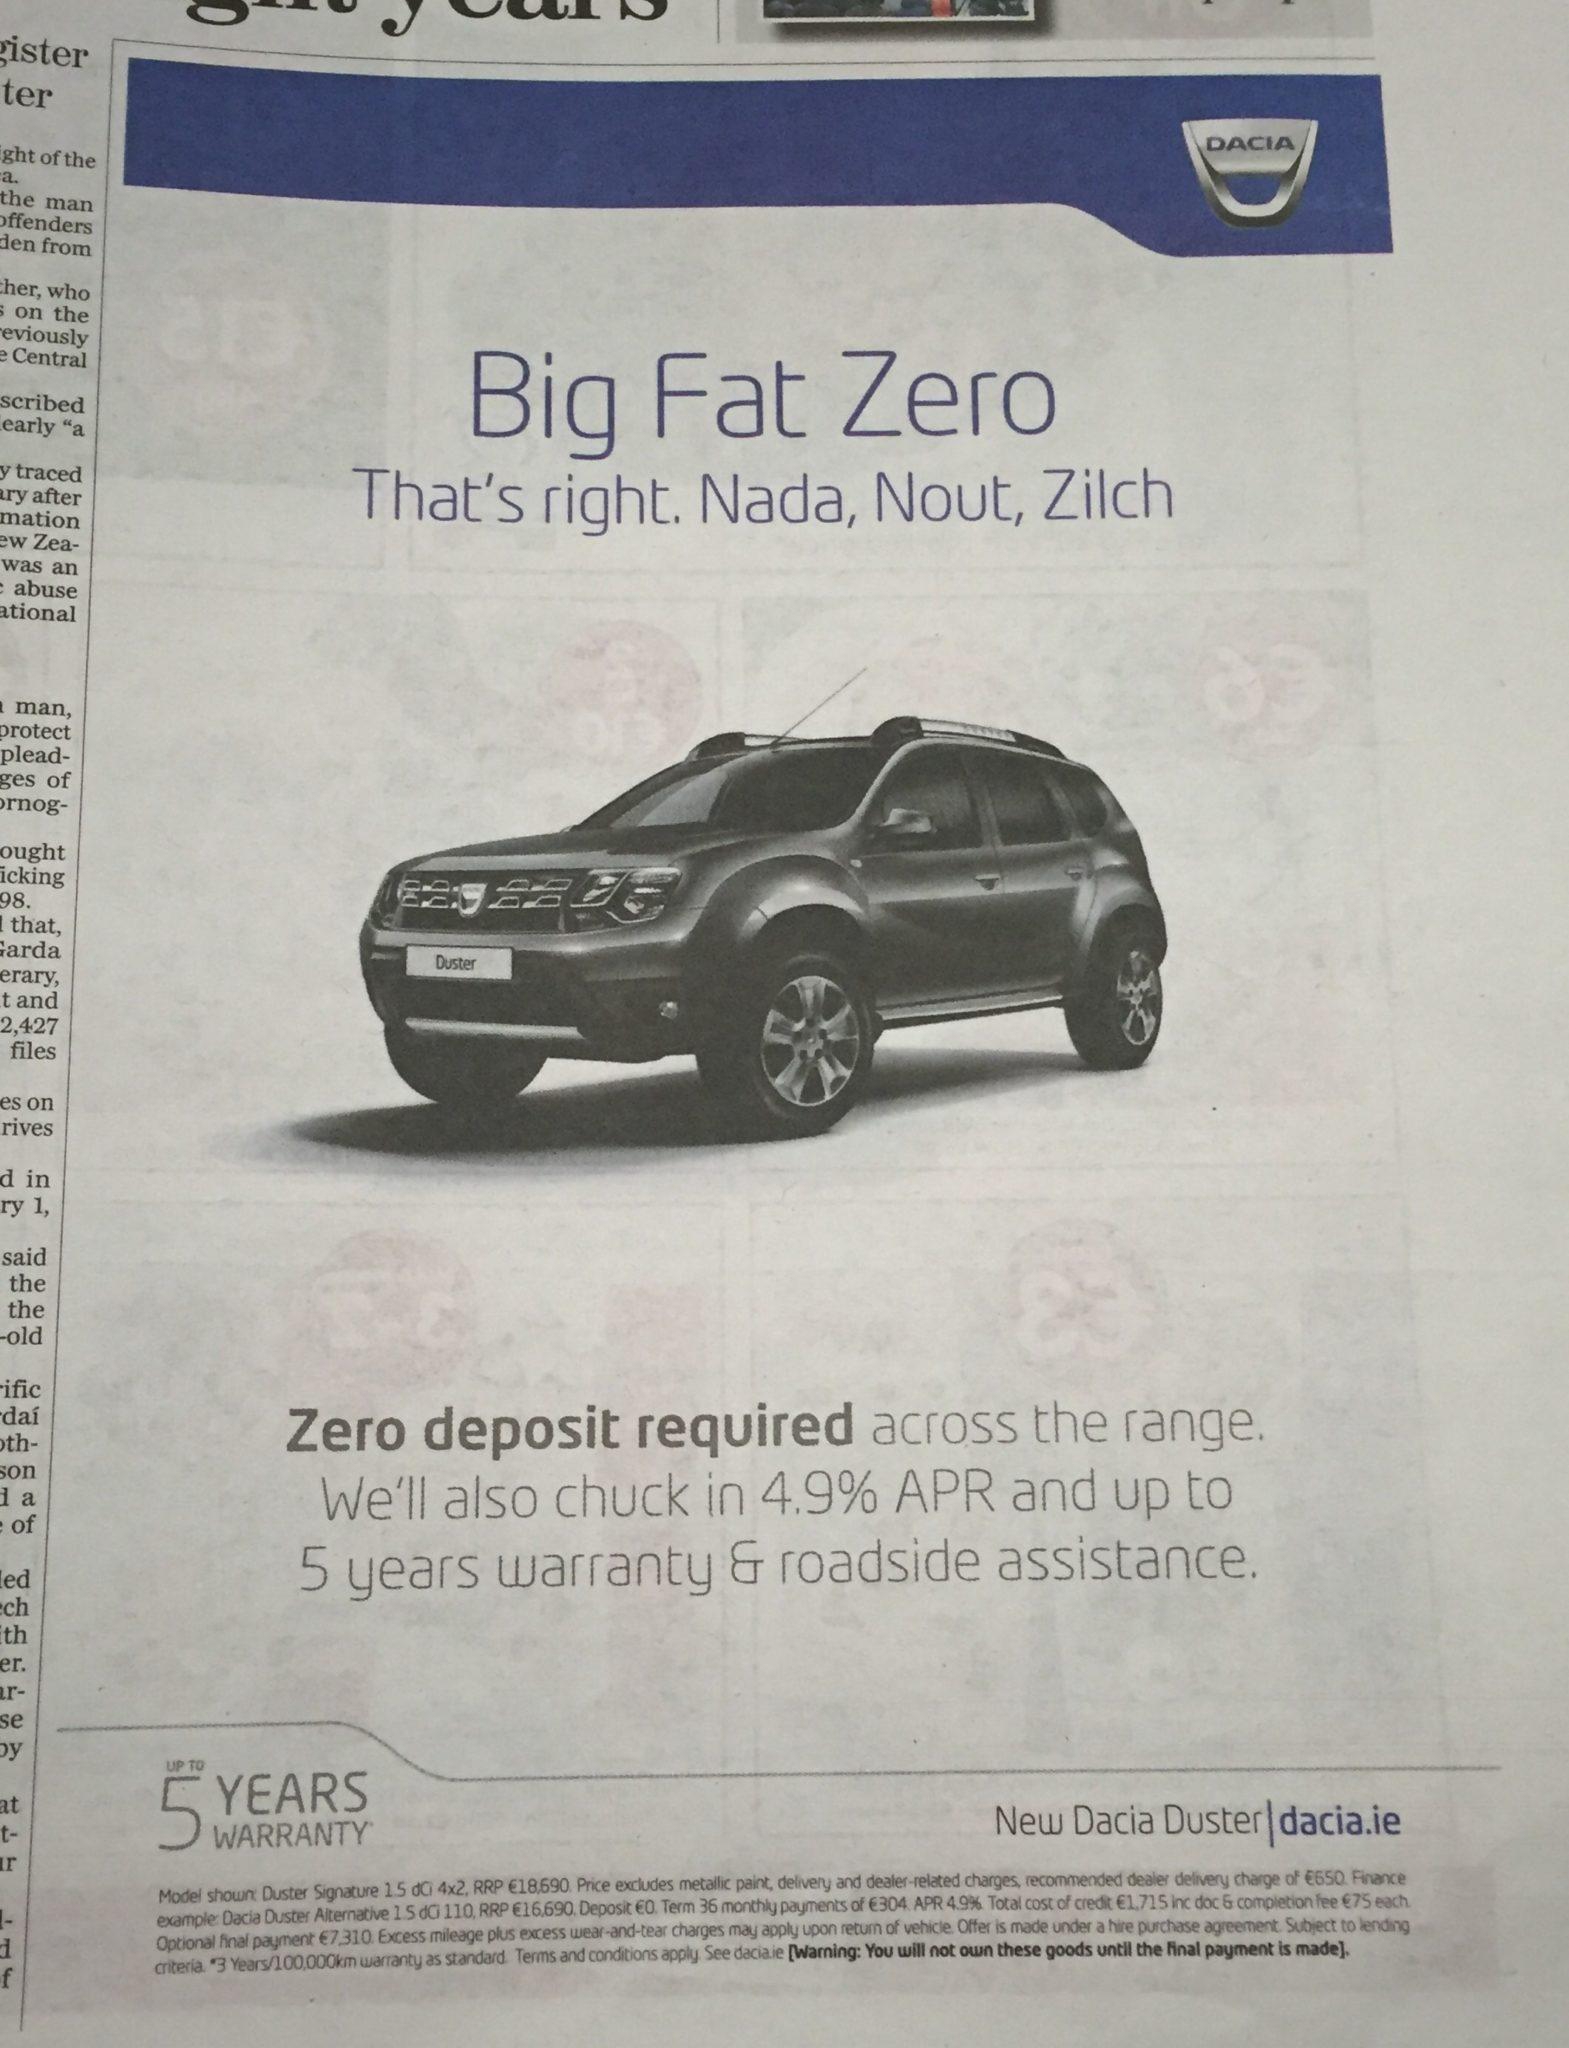 Dacia – big fat zero